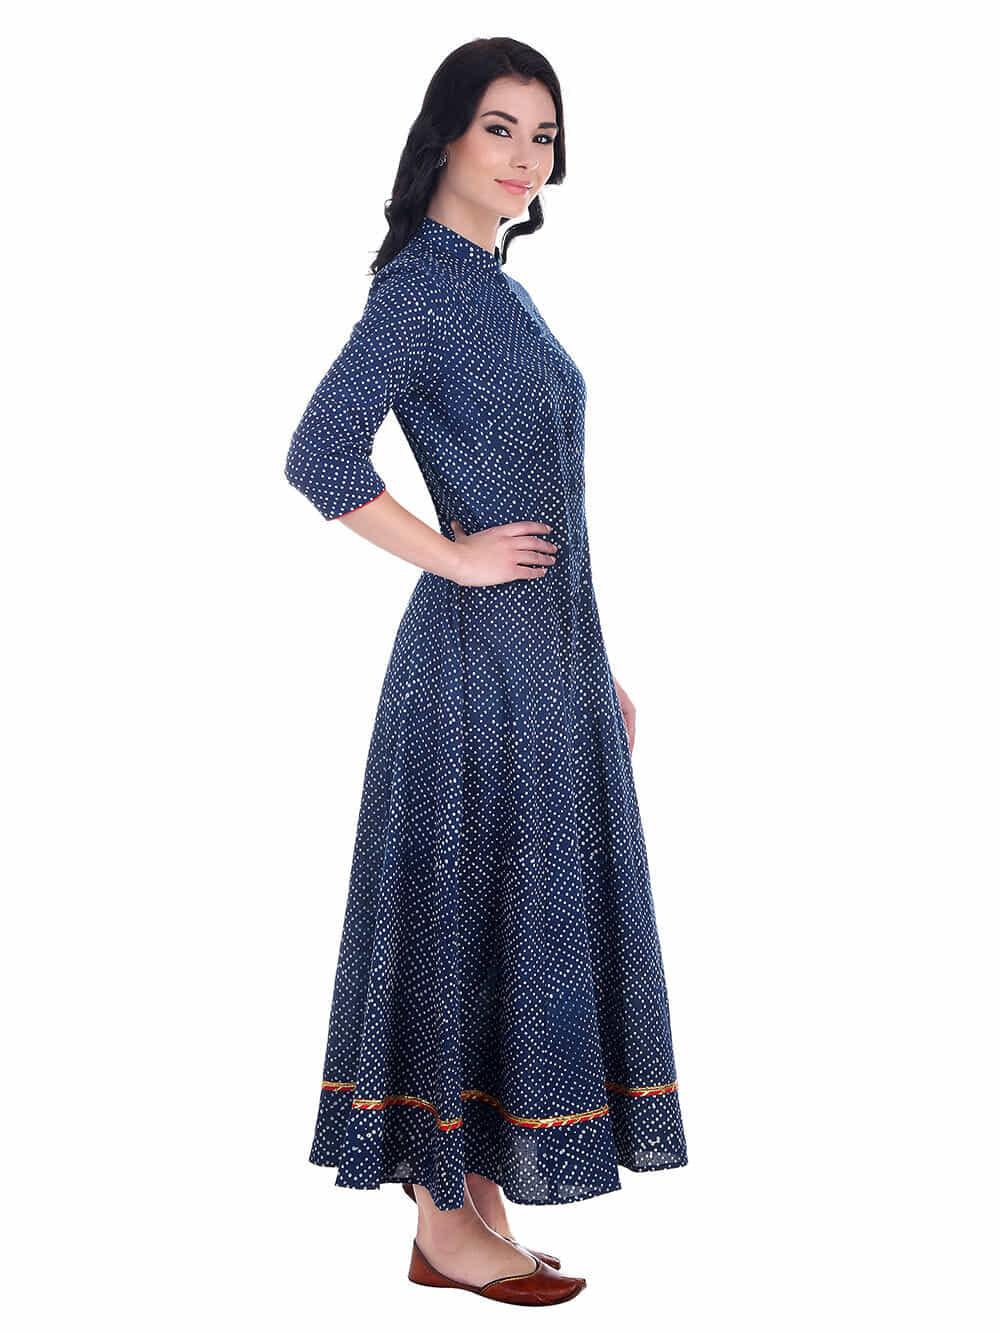 Where can i buy a maxi dress